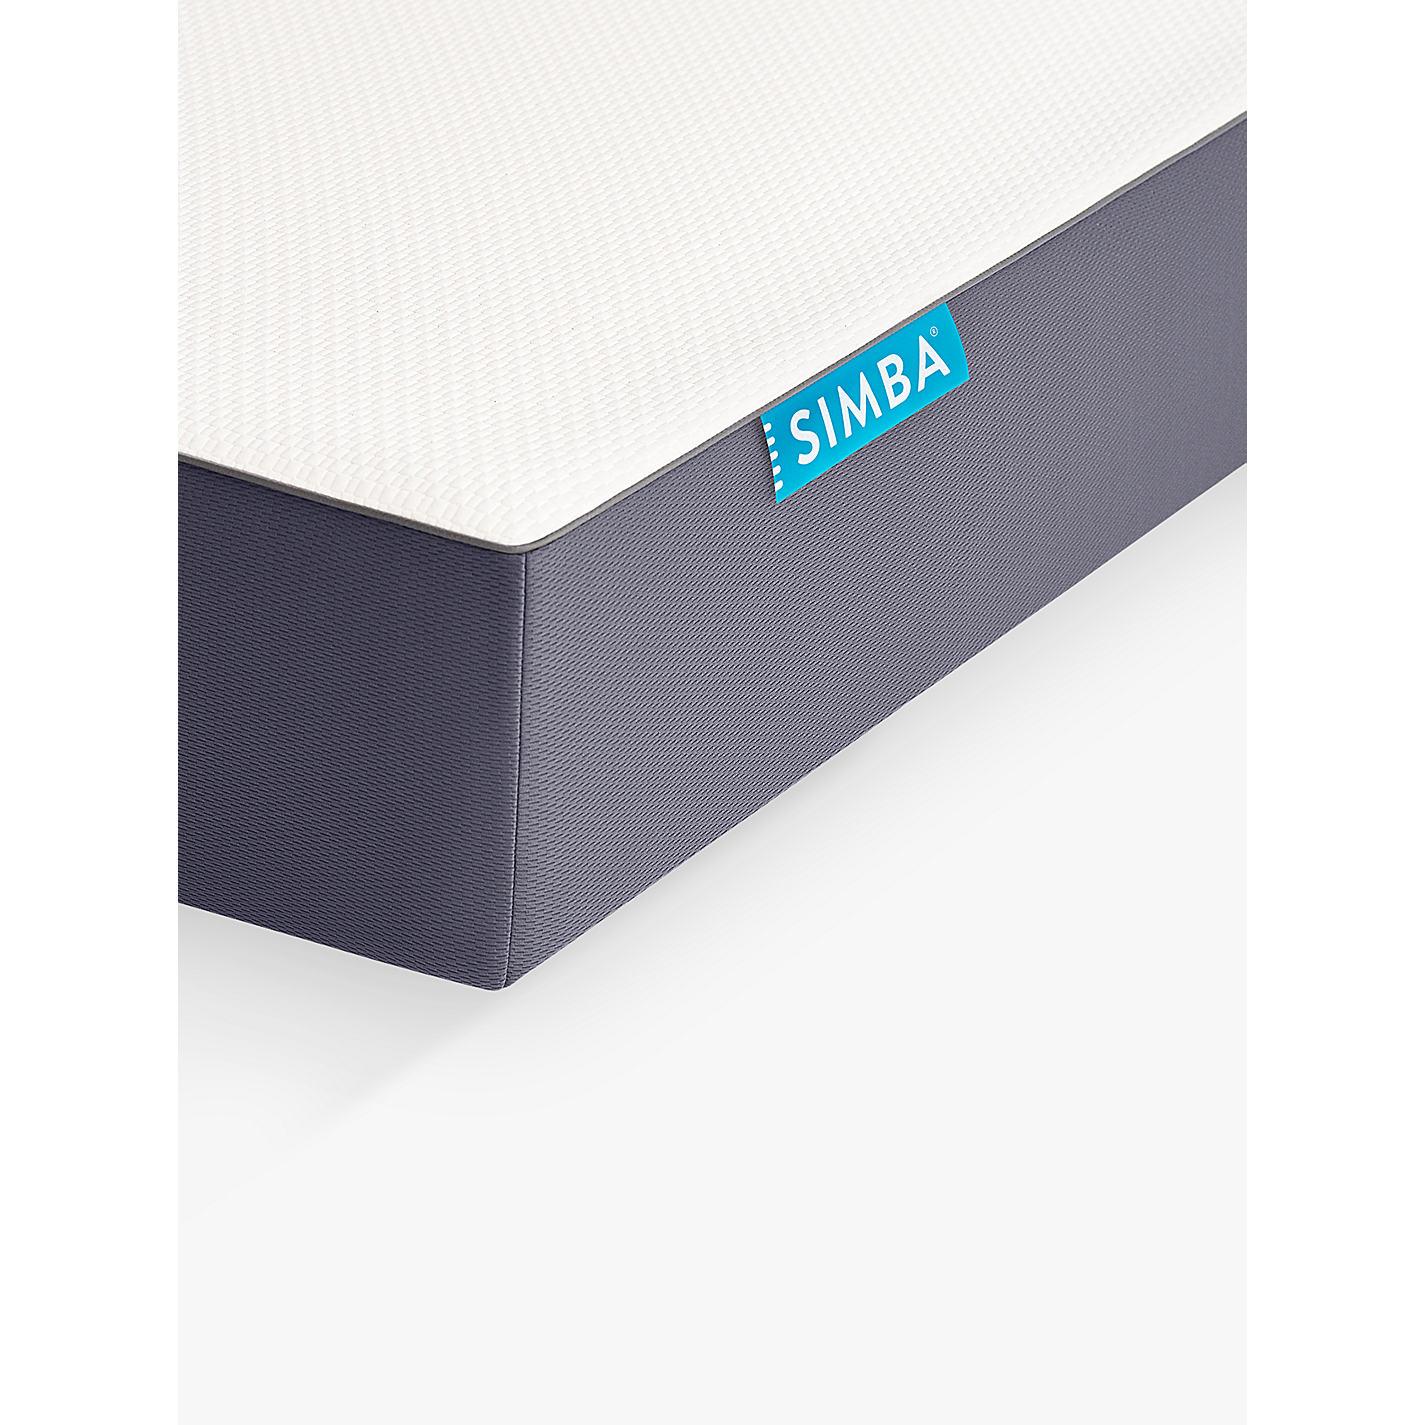 Buy Simba Hybrid Memory Foam Pocket Spring Mattress Medium King  # Support Tele Ikea